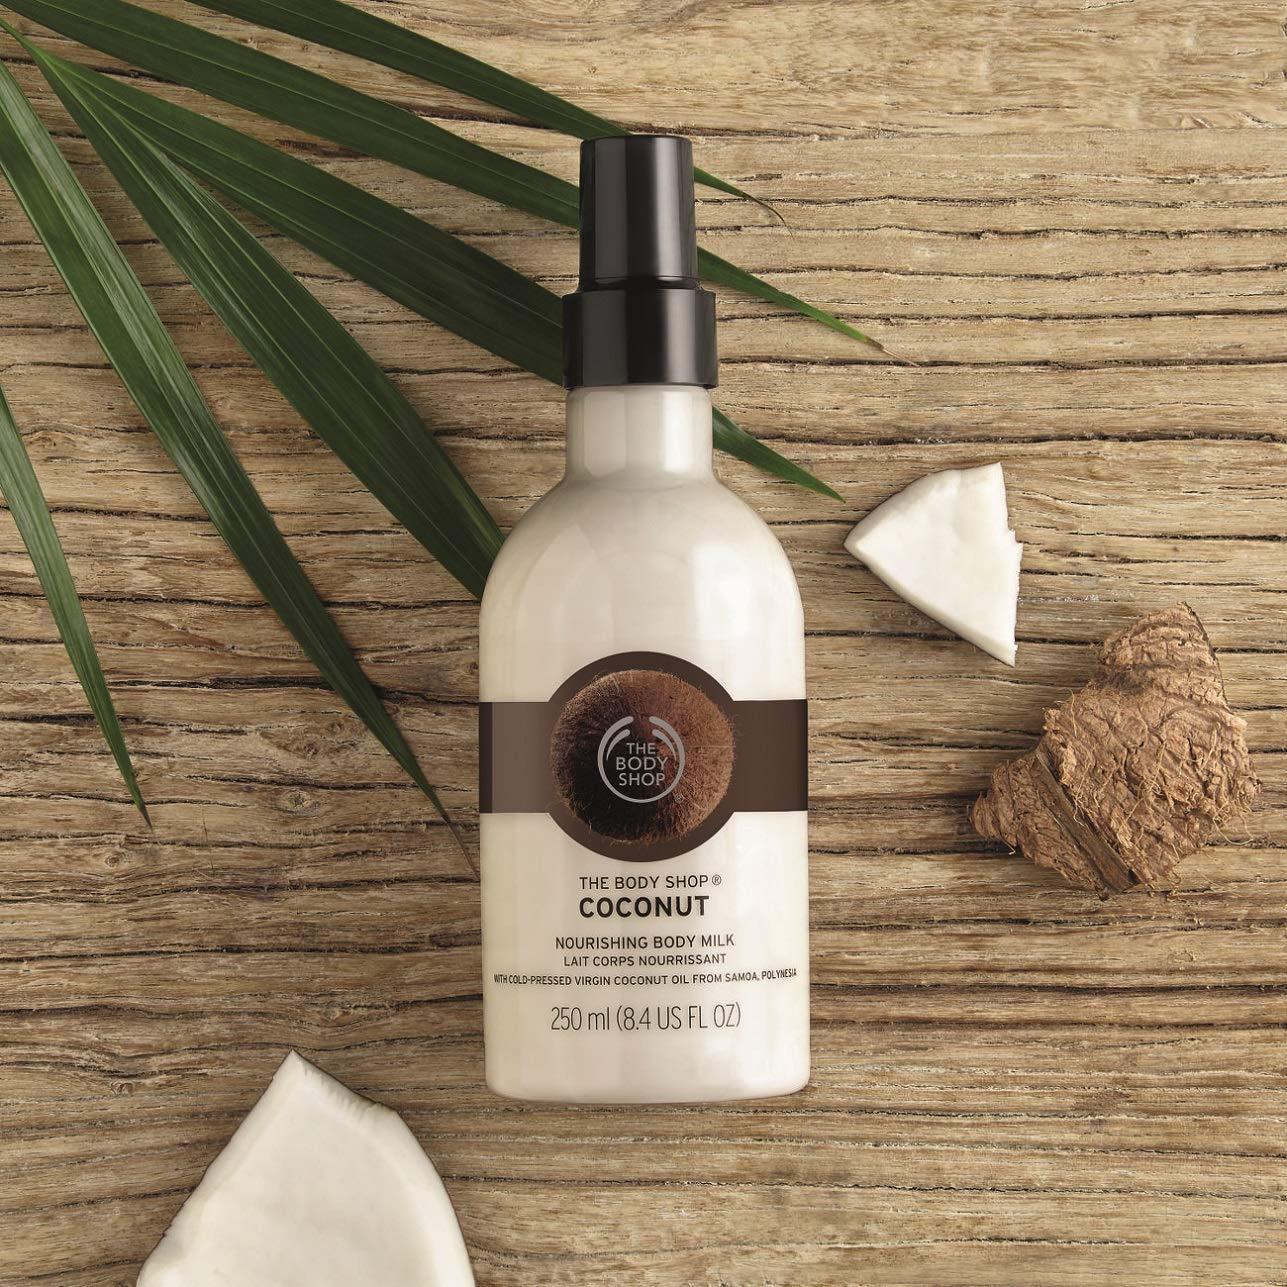 The-Body-Shop-Coconut-Nourishing-Body-Milk